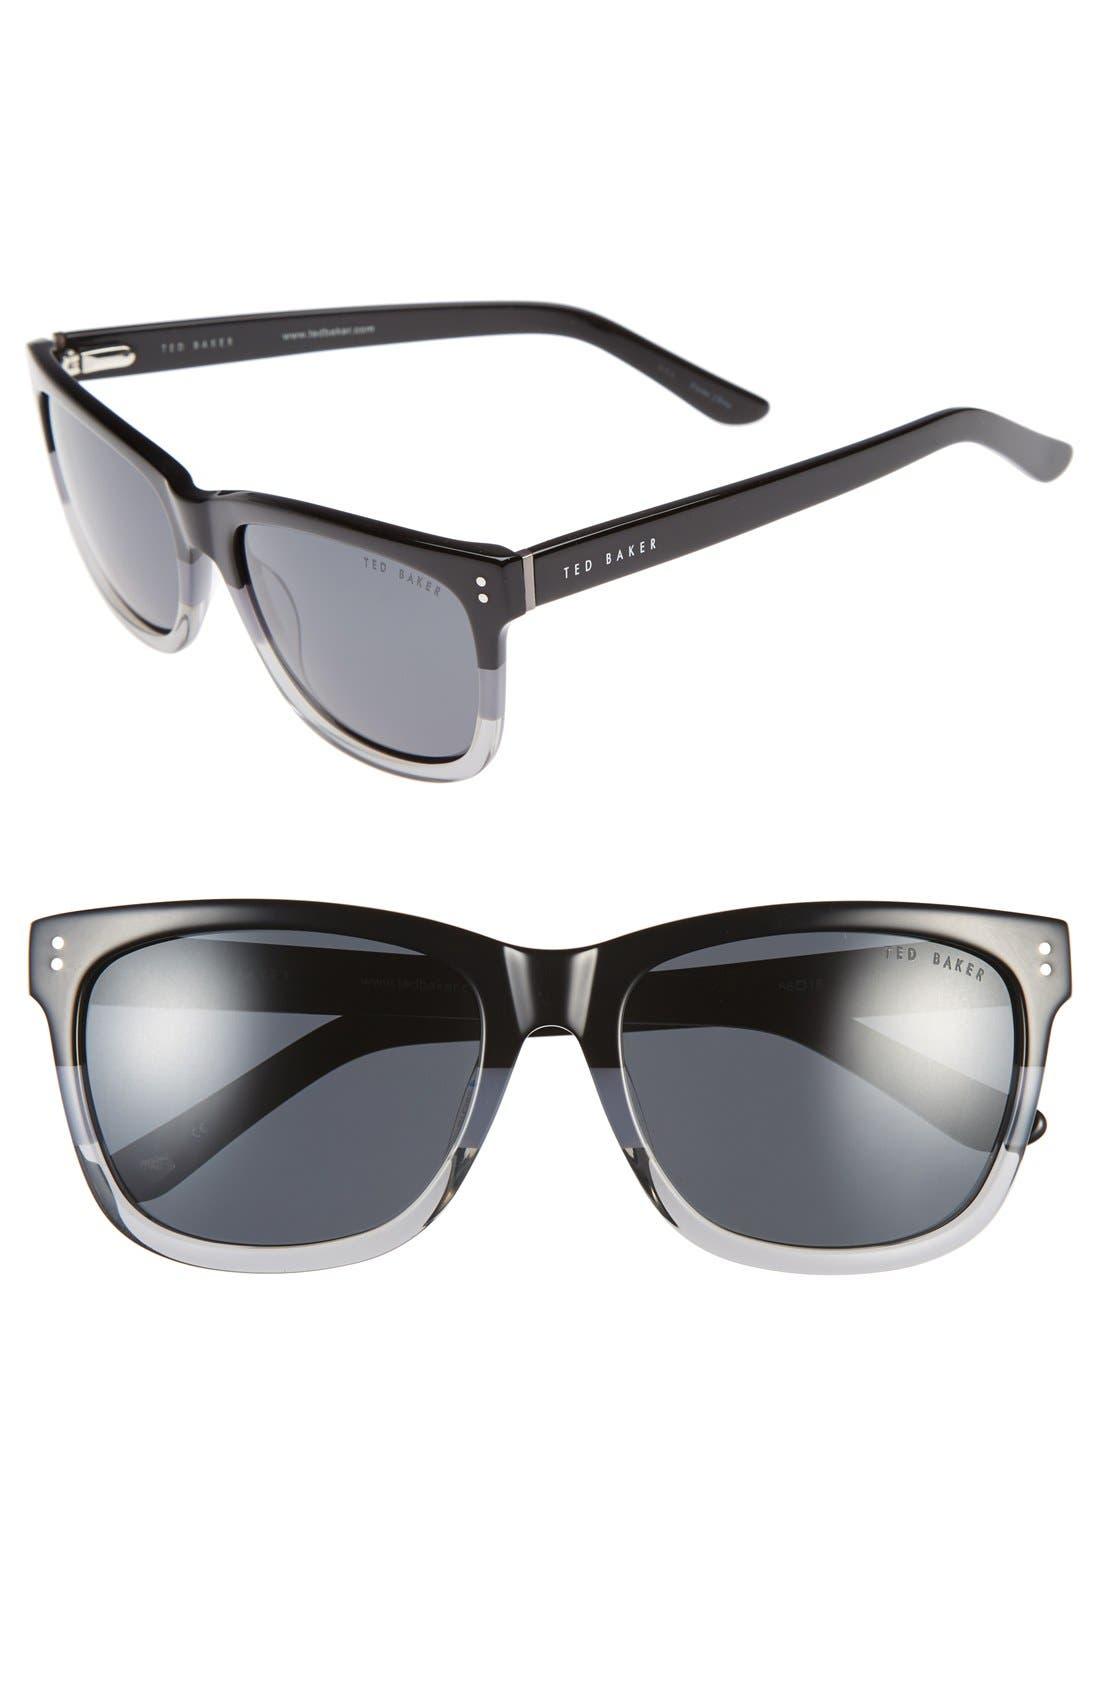 Main Image - Ted Baker London 56mm Polarized Retro Sunglasses